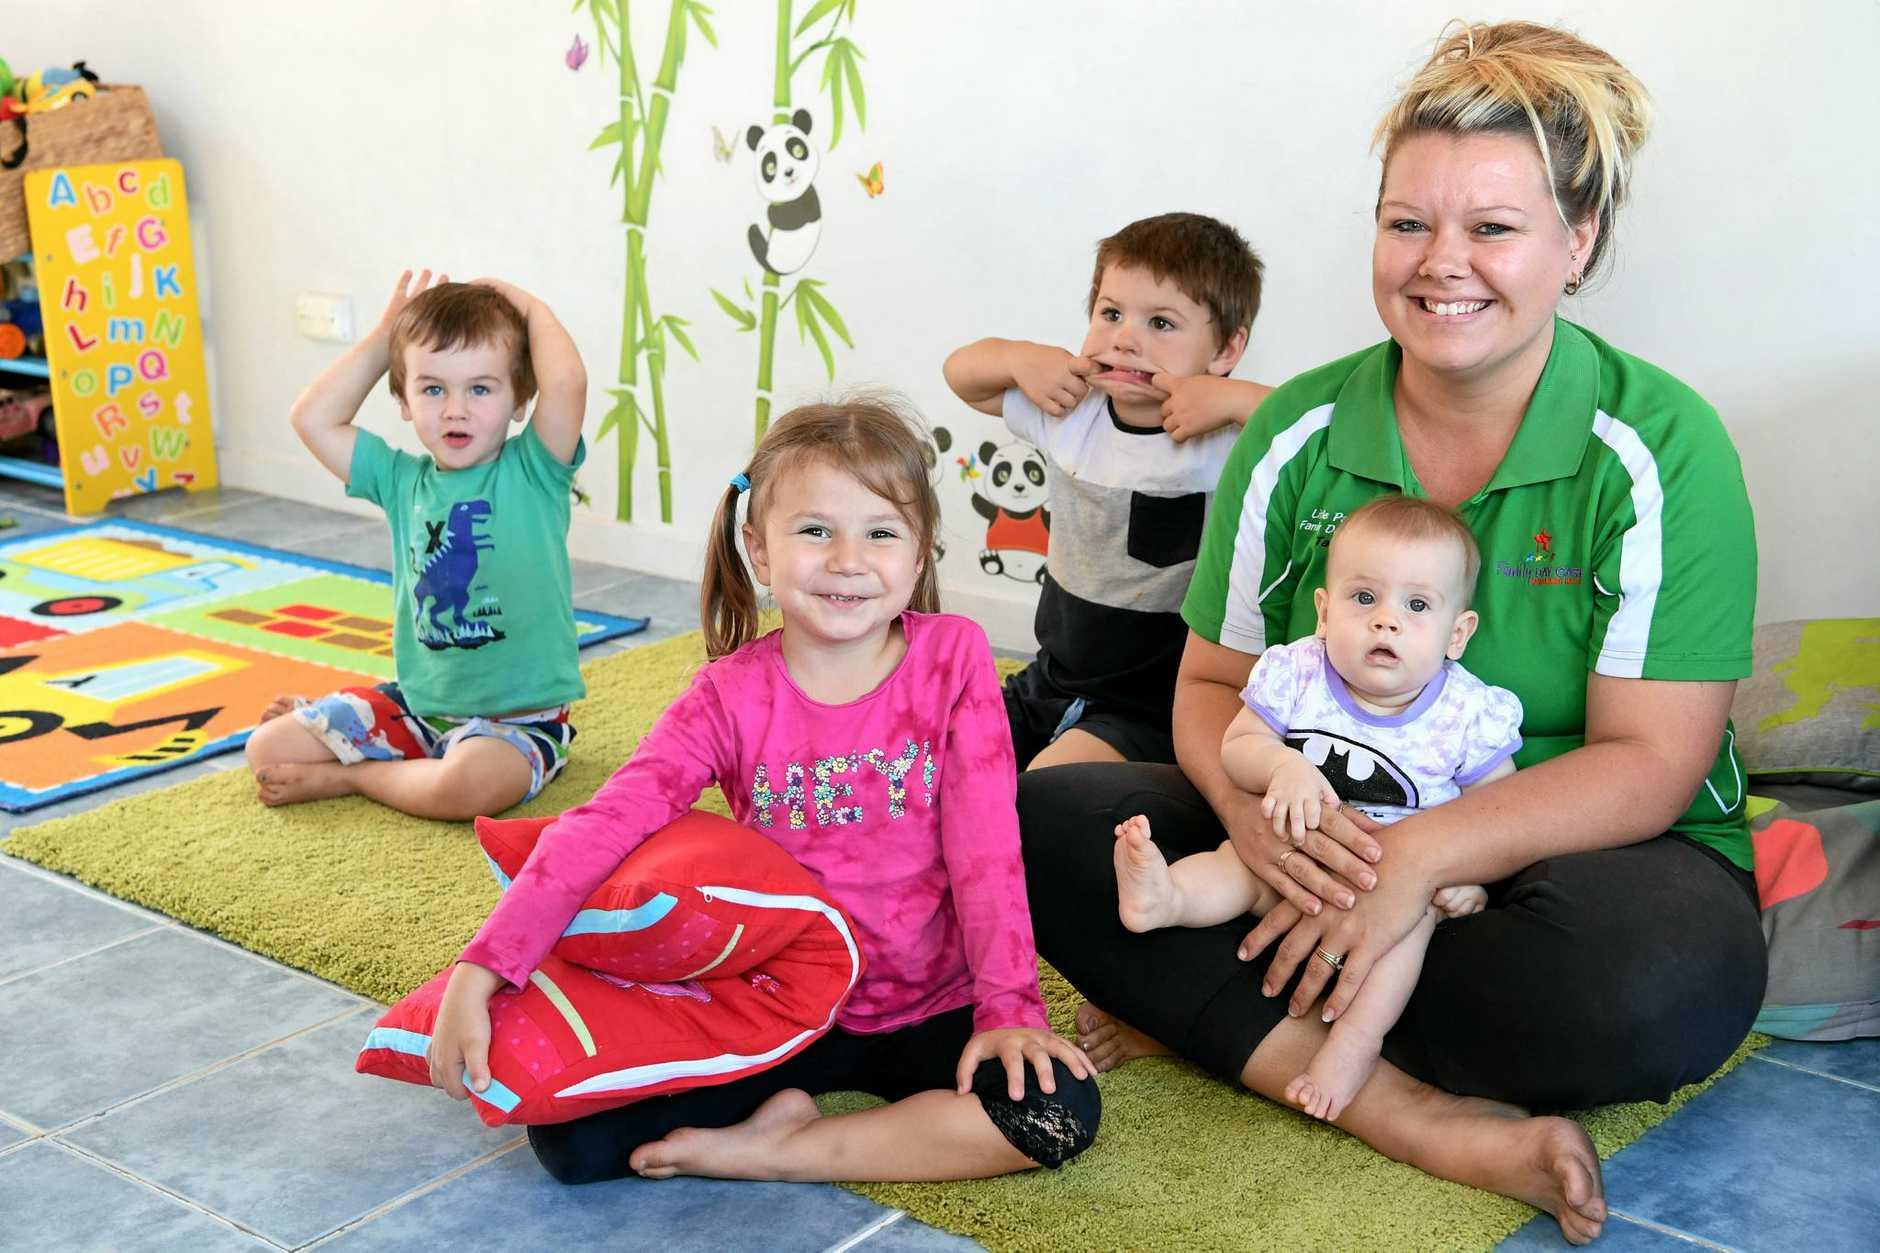 FUN TIMES: Little Panda Family Day Cares Tara Smith with Mason Turnbull, Lylaah Cadeddu, Sonny Smith and Kacey Turnbull.